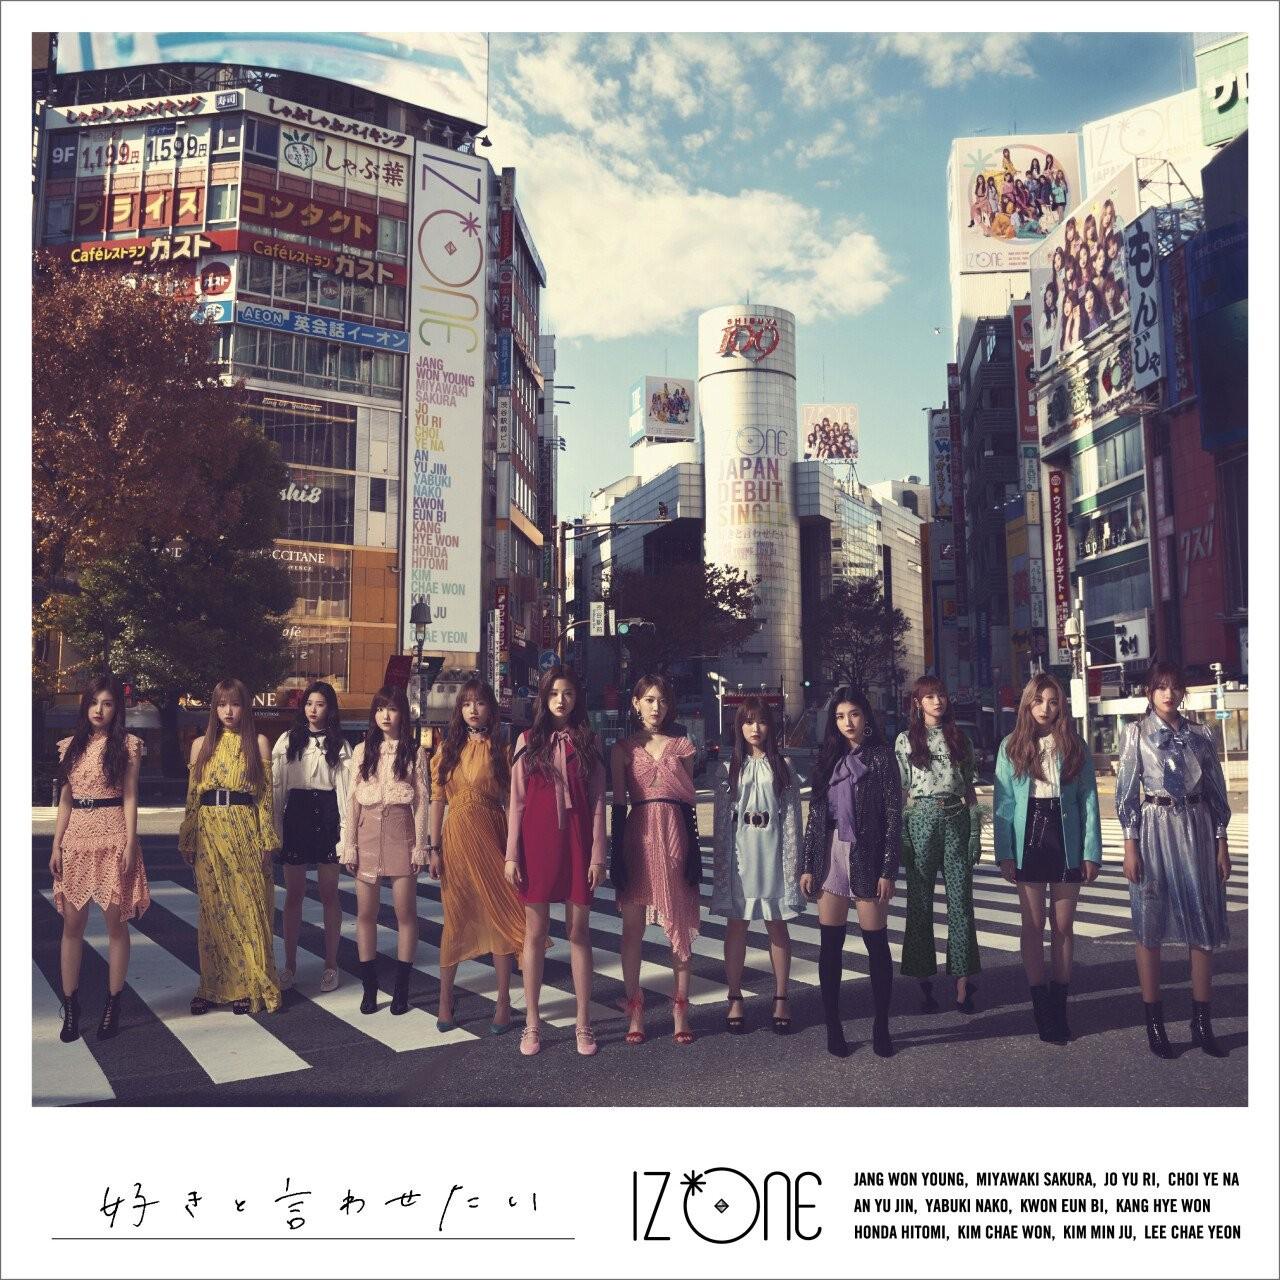 IZ*ONE (아이즈원) – 好きと言わせたい [FLAC + MP3 320] [2019.02.06]